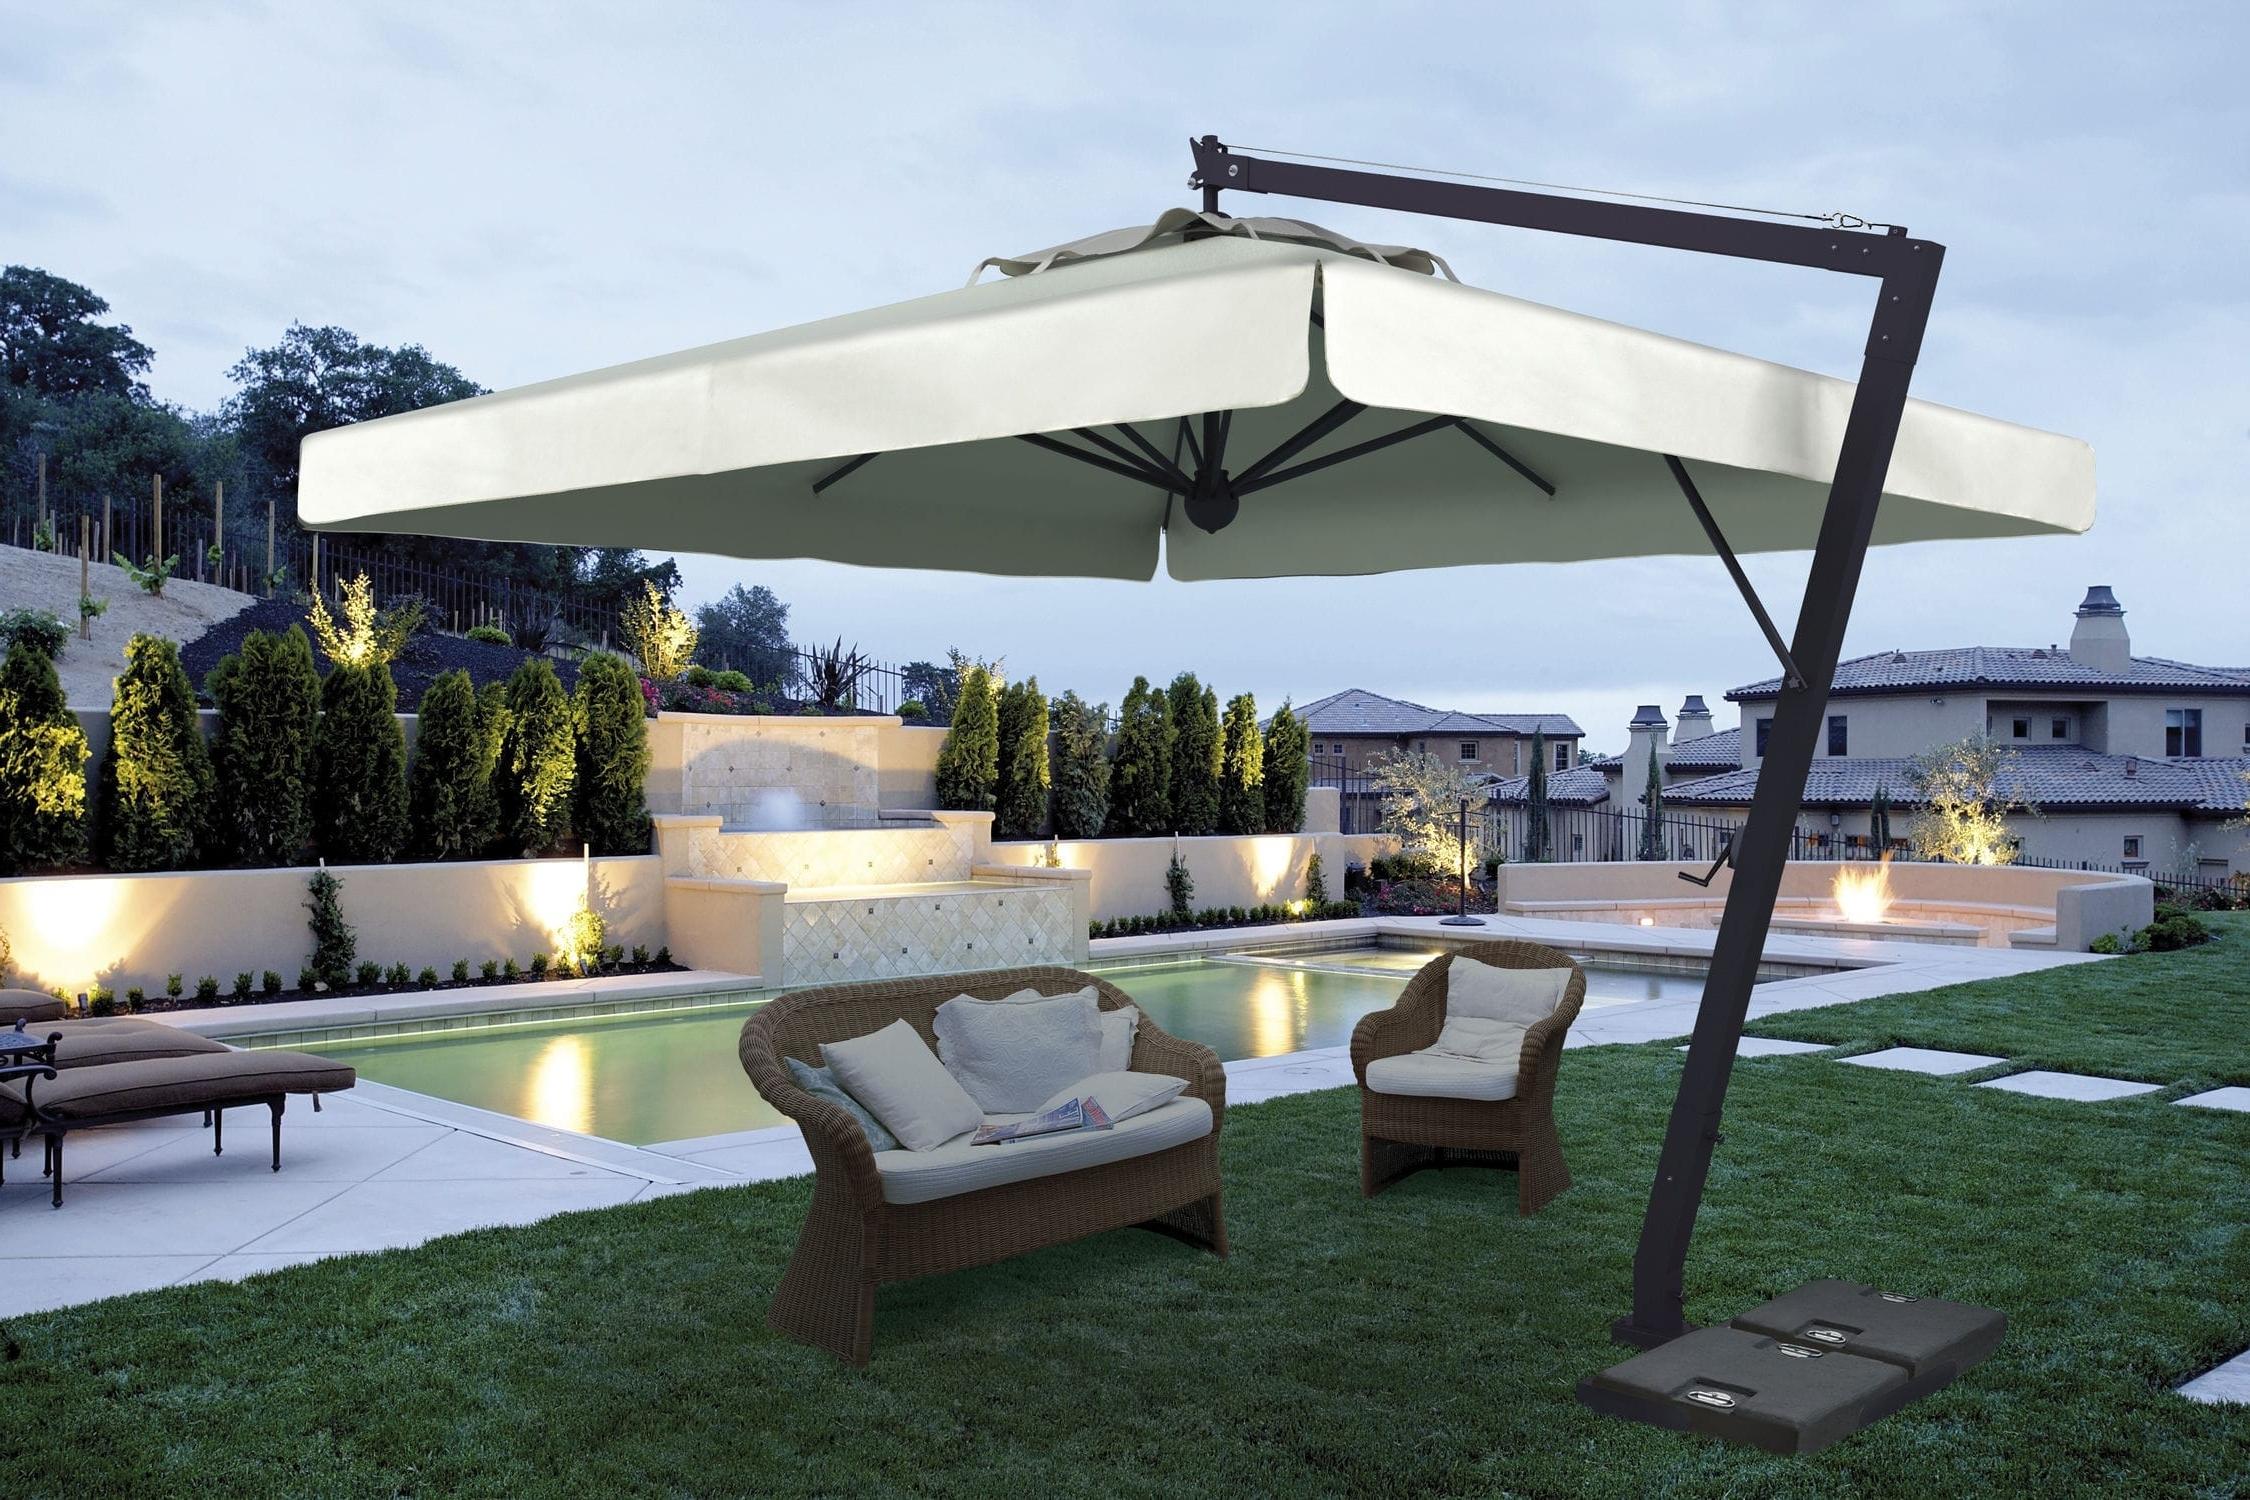 Giant Patio Umbrellas Throughout Well Known Offset Patio Umbrella Commercial Aluminum Steel Leonardo (View 4 of 20)